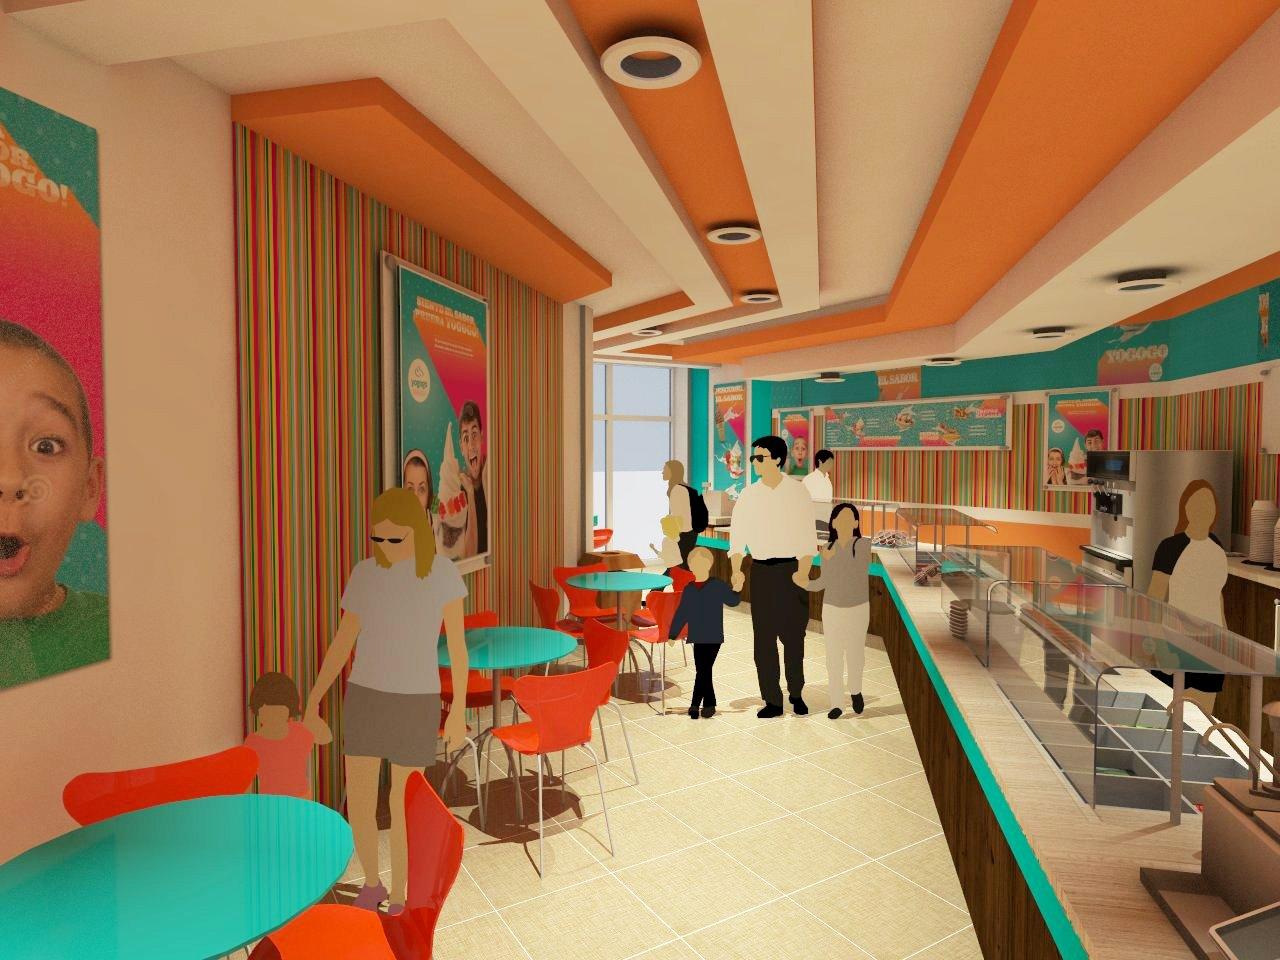 Arquitectura martin abel local comercial yogurt yogogo for Arquitectura interior